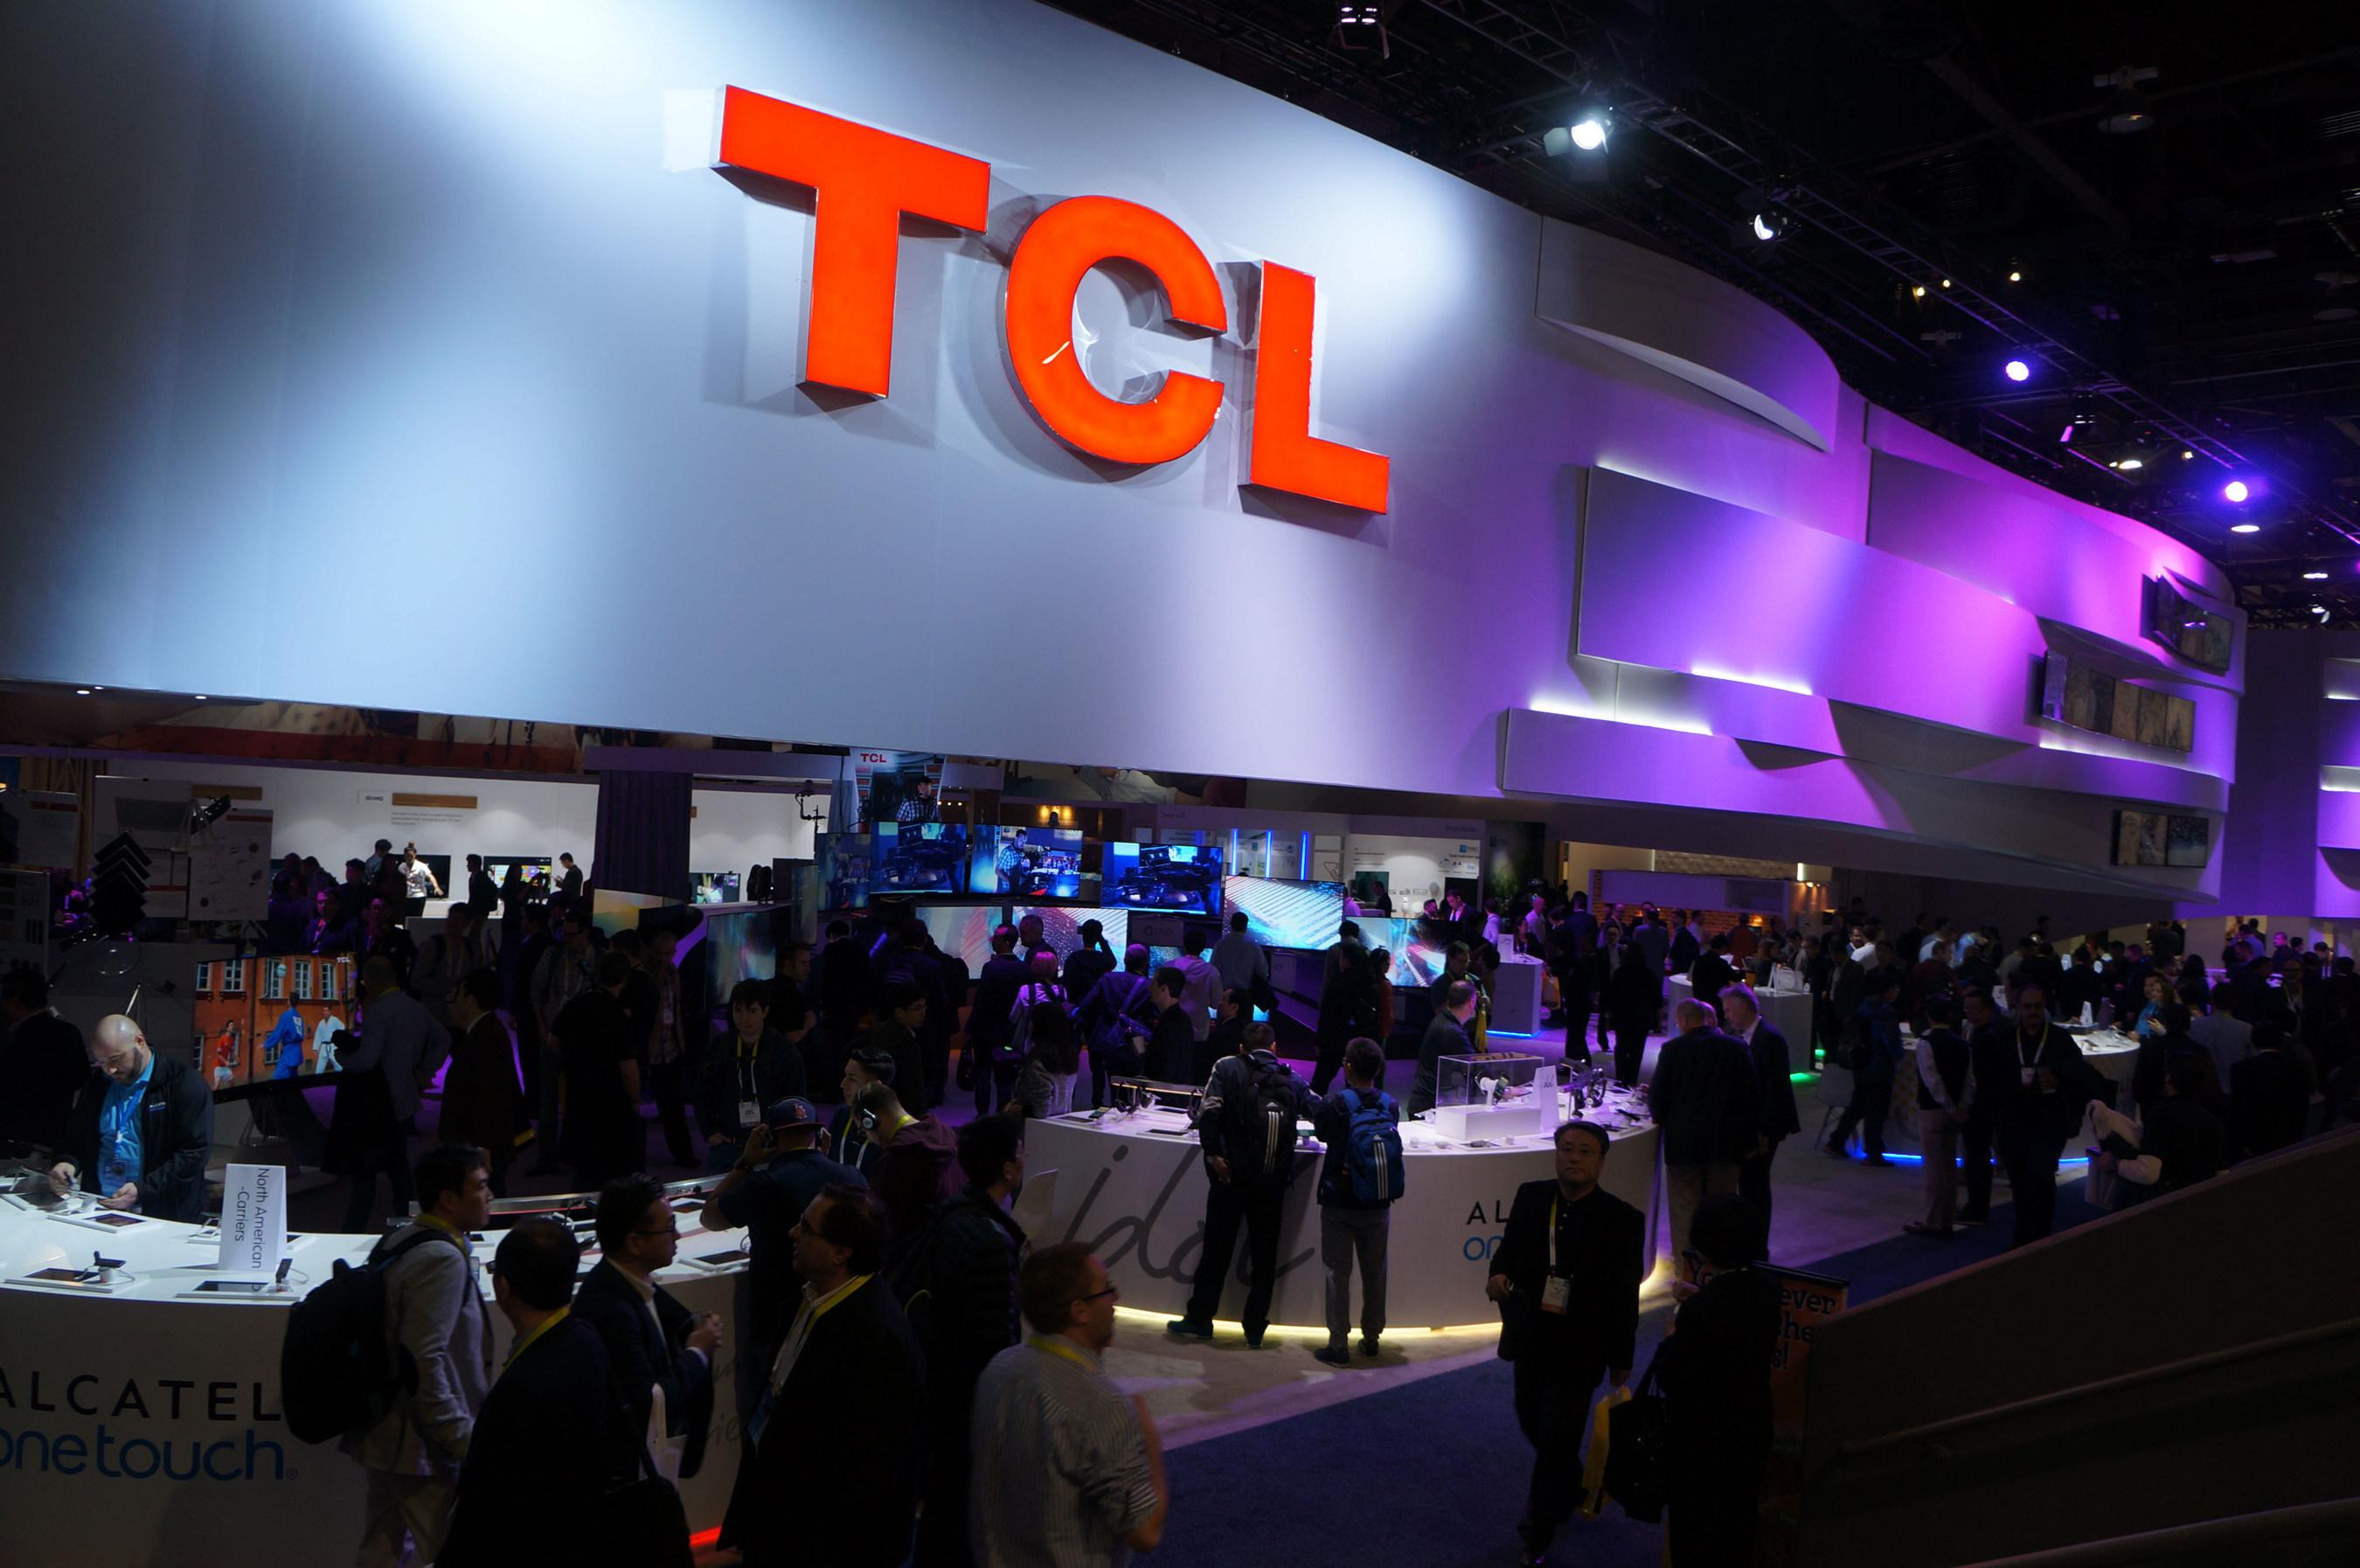 TCL Corporation präsentiert auf CES 2016 komplette Palette innovativer Produkte